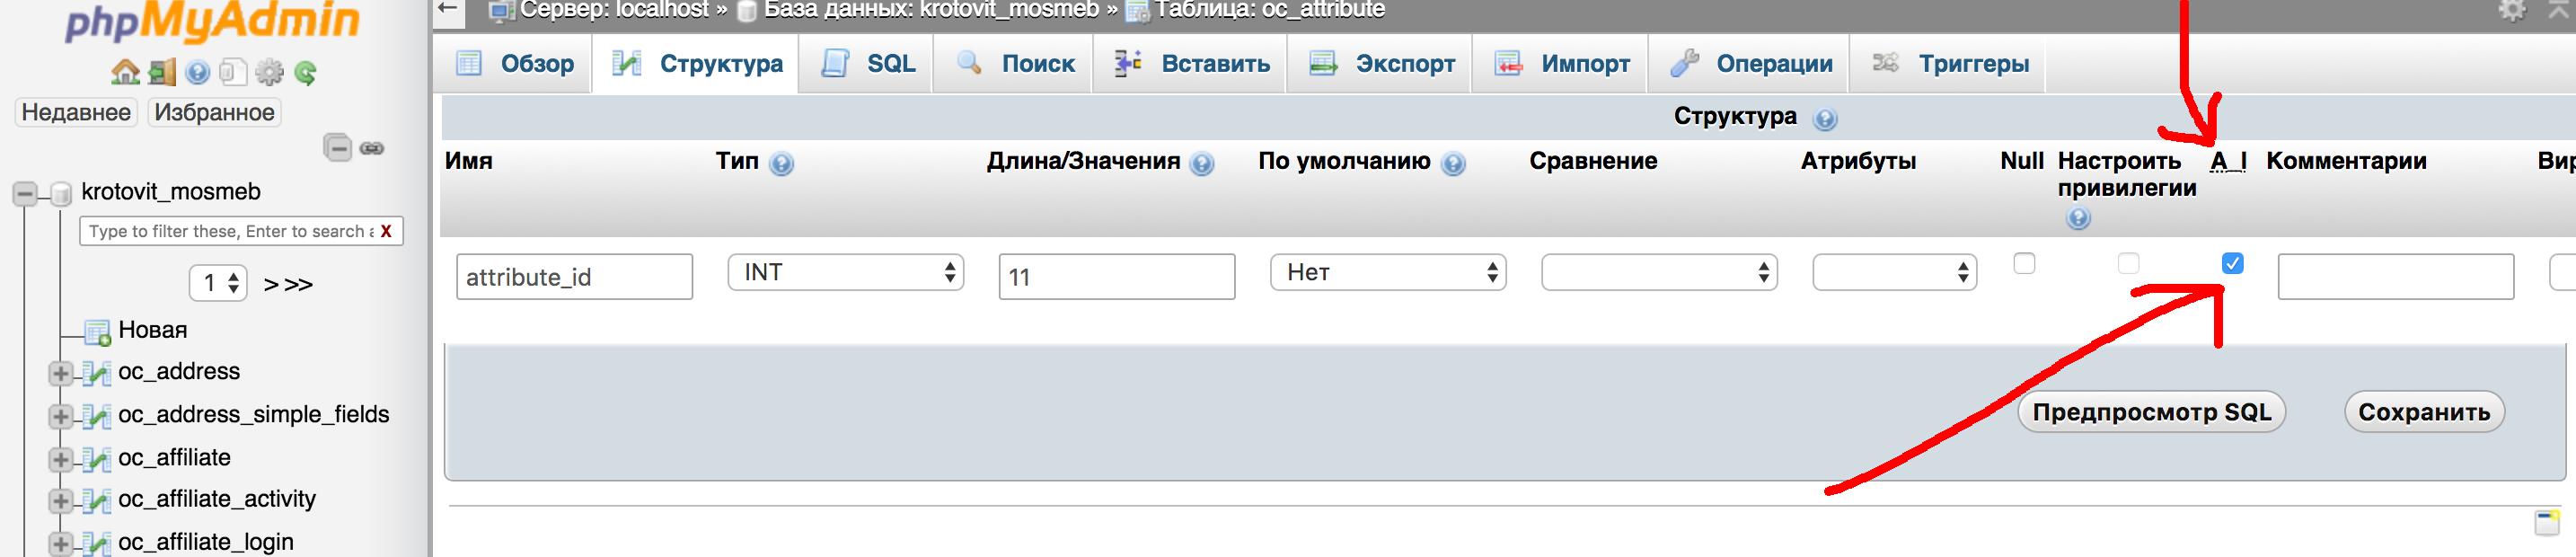 как включитьAUTO_INCREMENT через phpmyadmin: